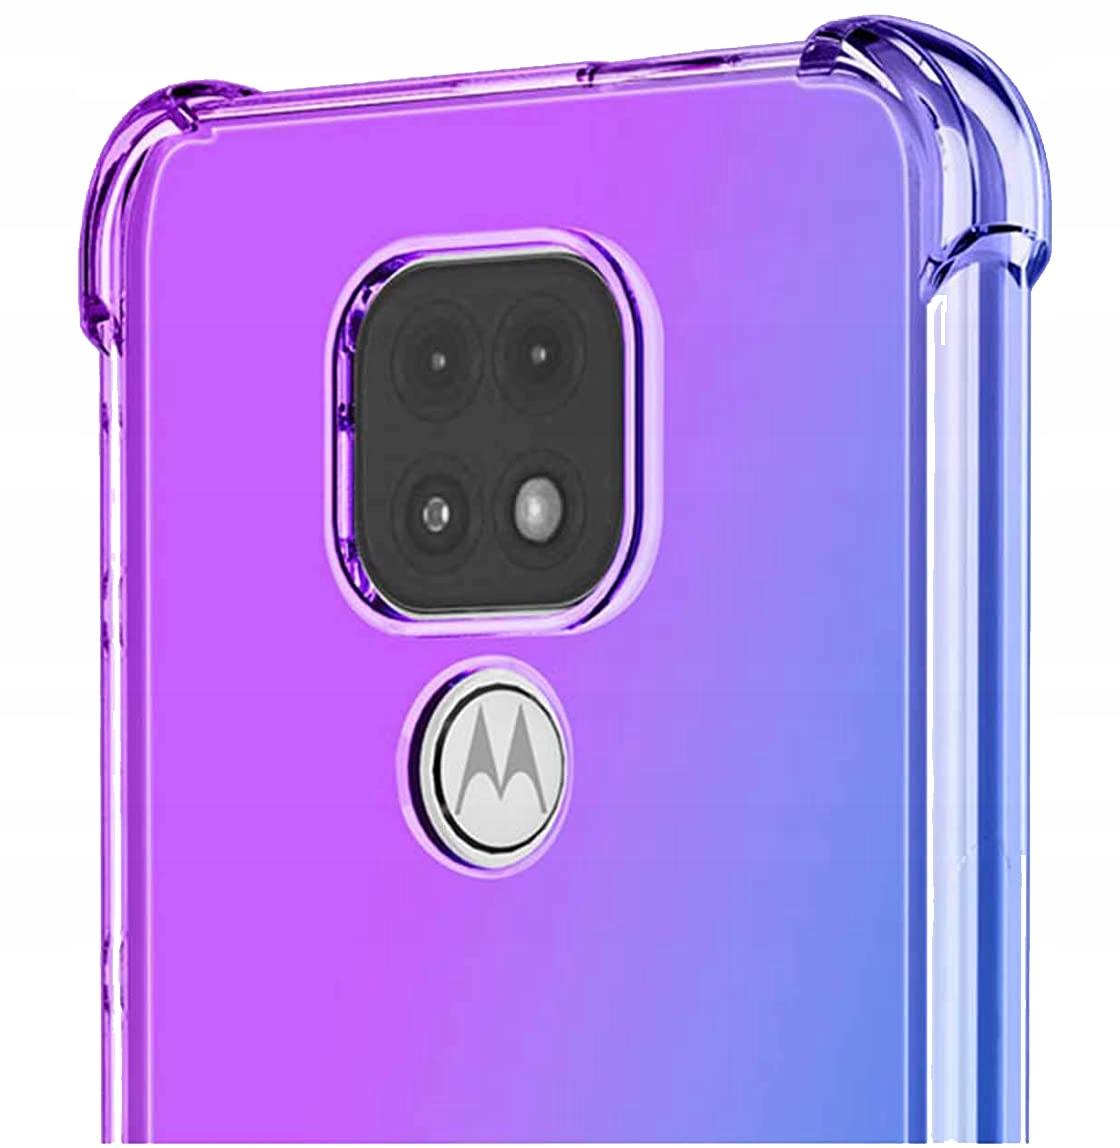 Etui do Motorola Moto G9 Play ANTI-SHOCK + Szkło Dedykowany model Motorola Moto G9 Play